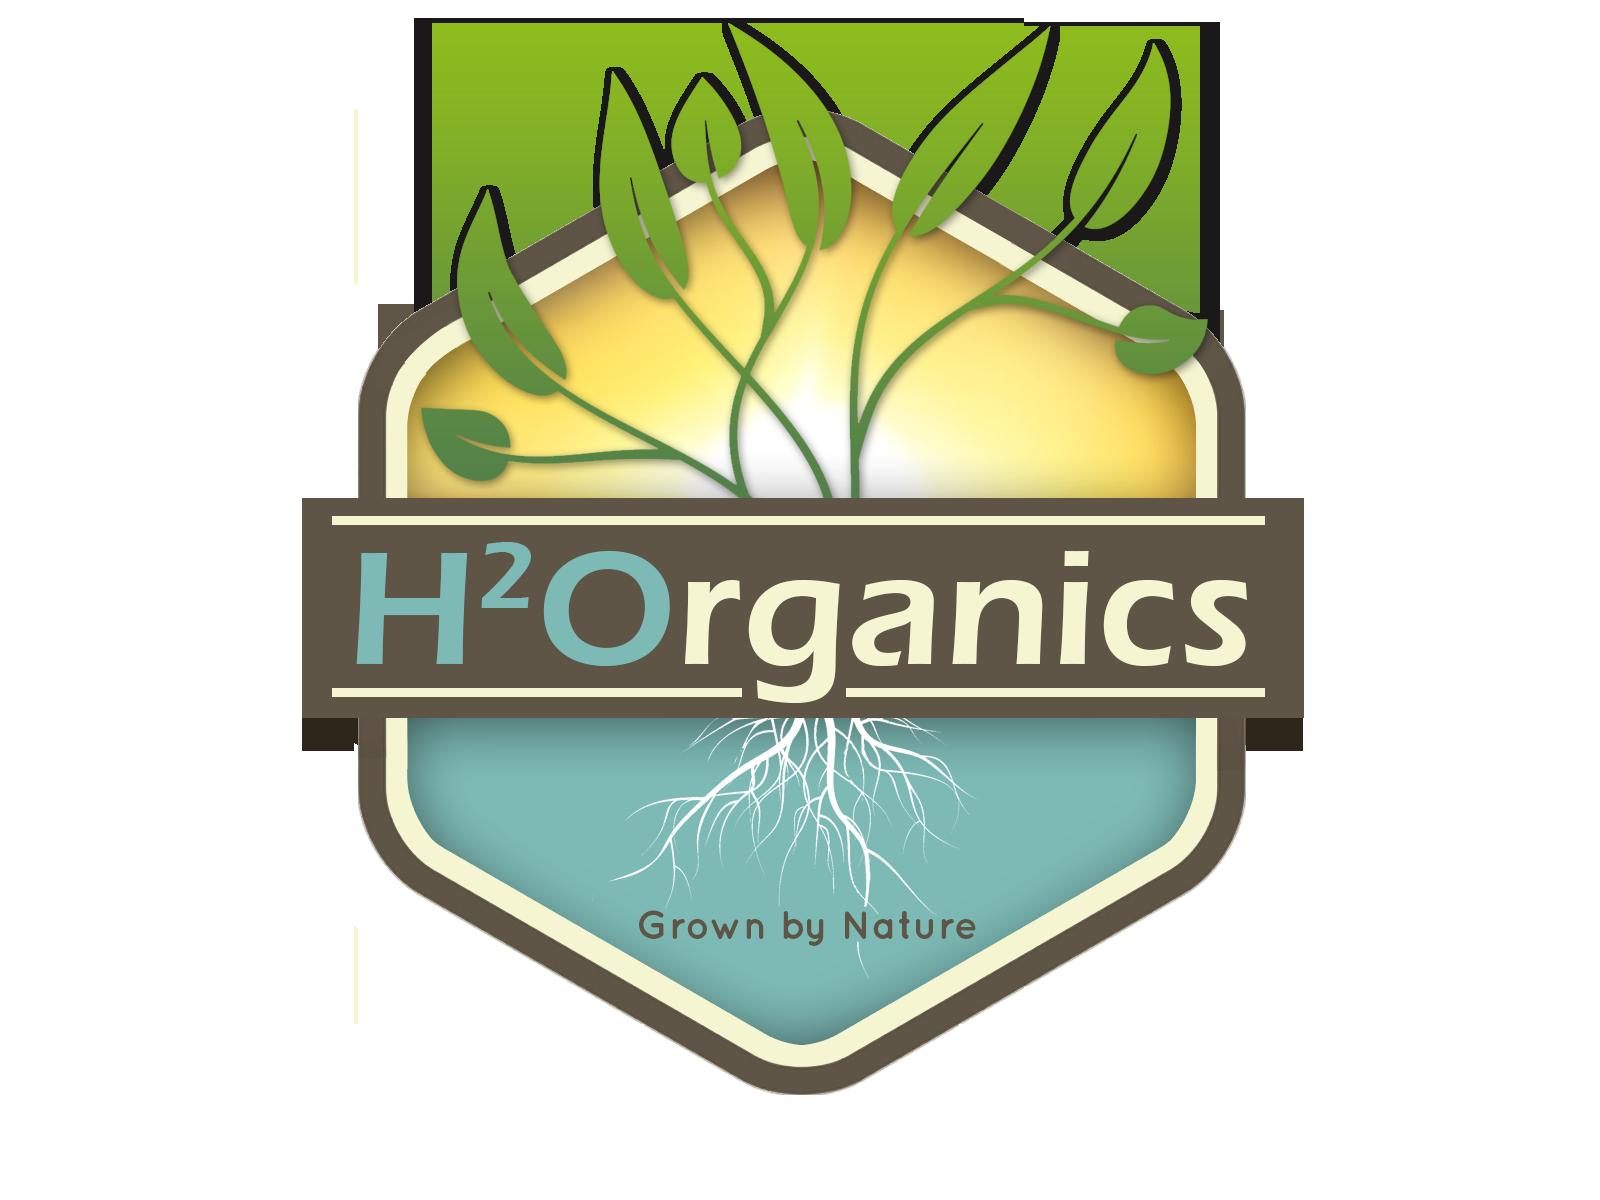 H2Organics